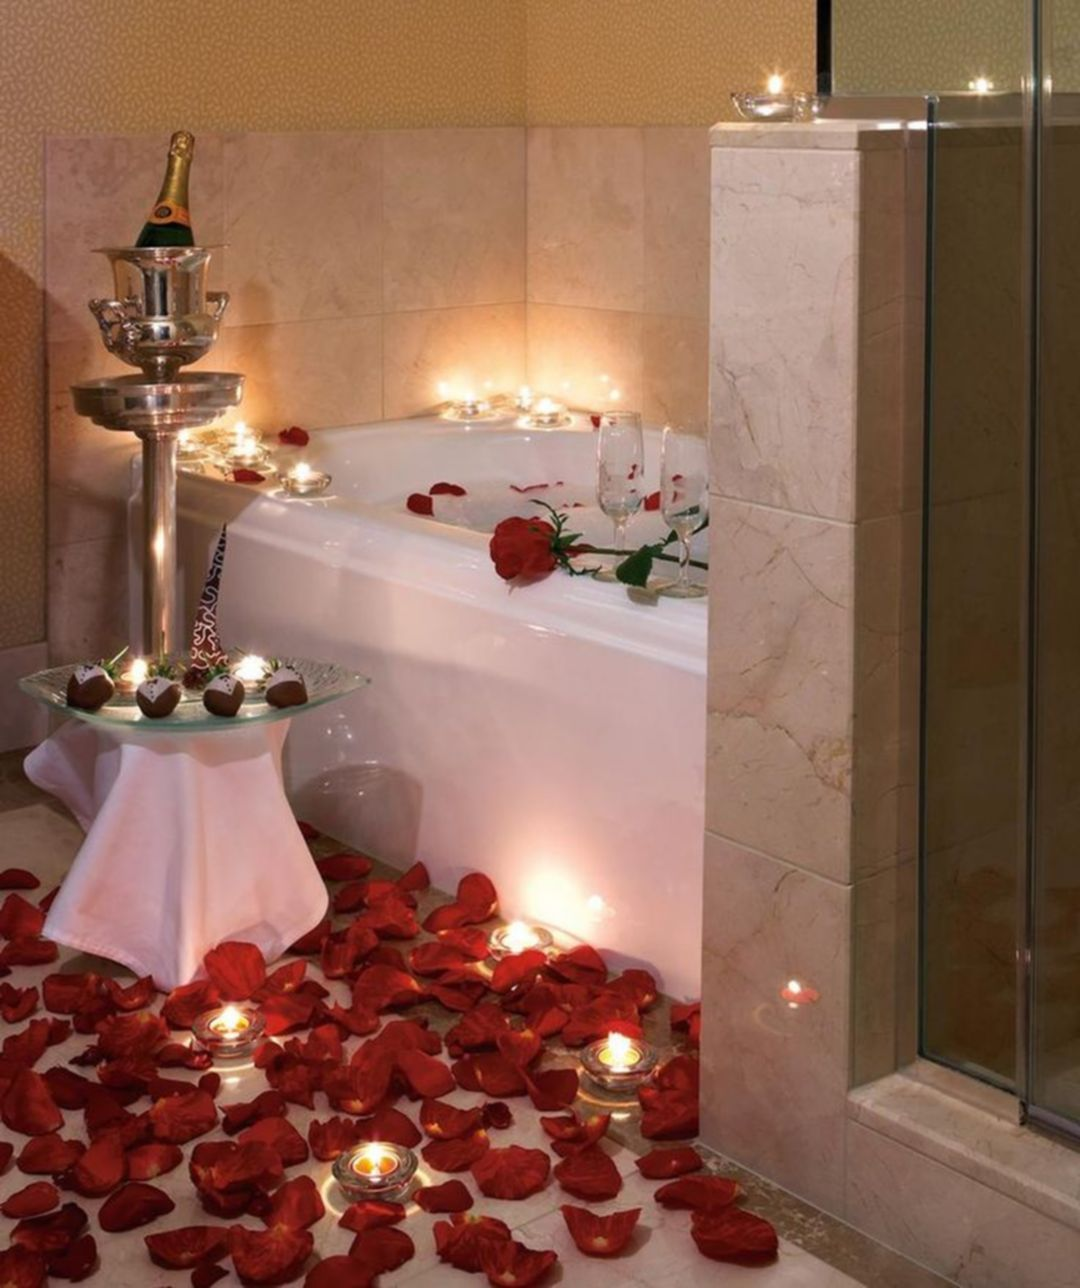 Top 8 Romantic Bath Decorations Ideas For Romantic Dating